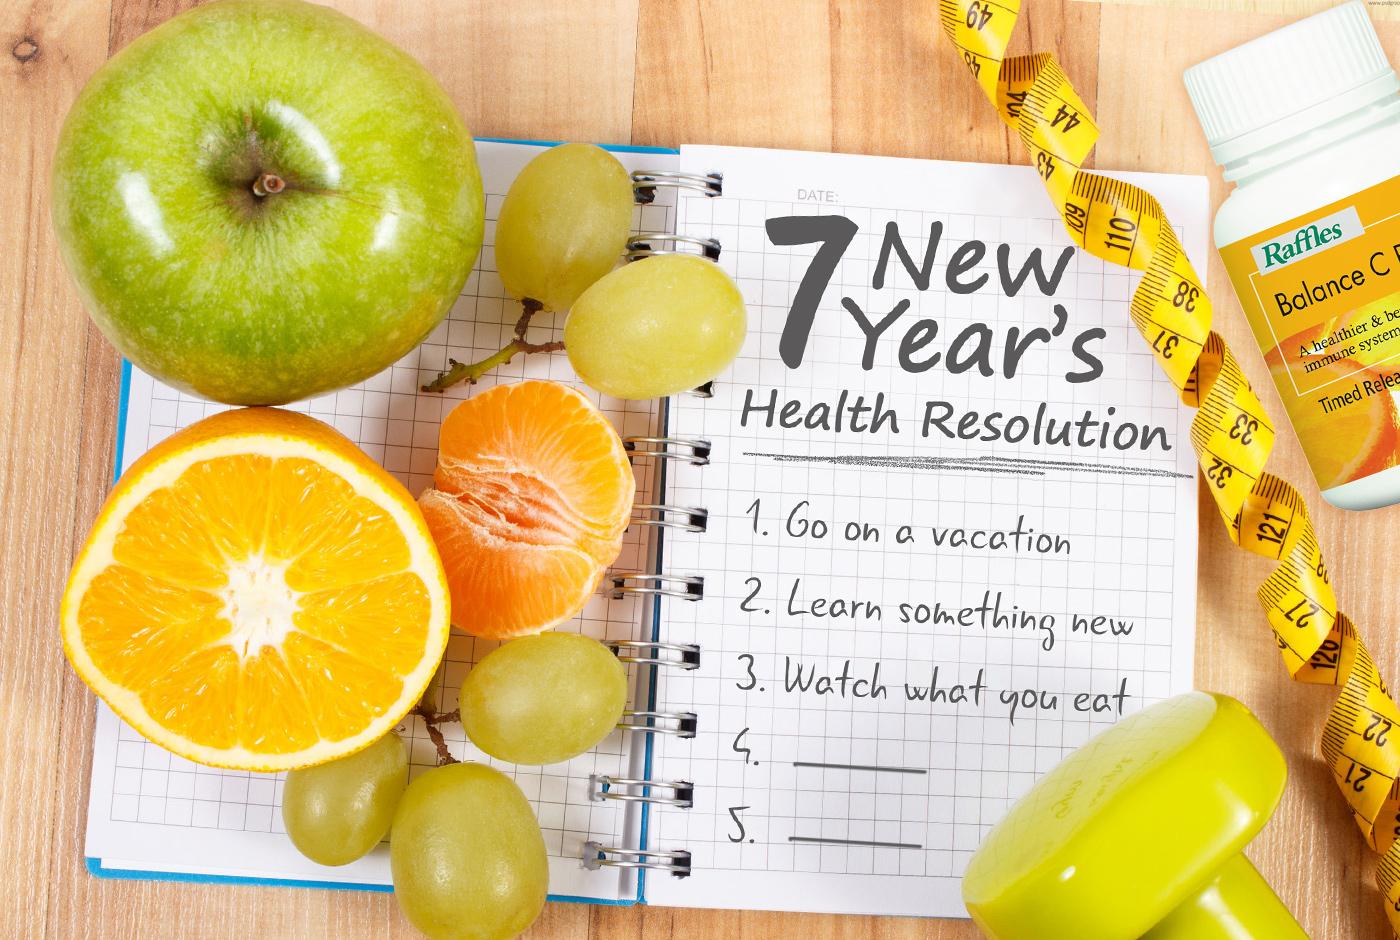 7 New Year's Health Resolution Ideas You Can Keep | | Raffles Health  Singapore